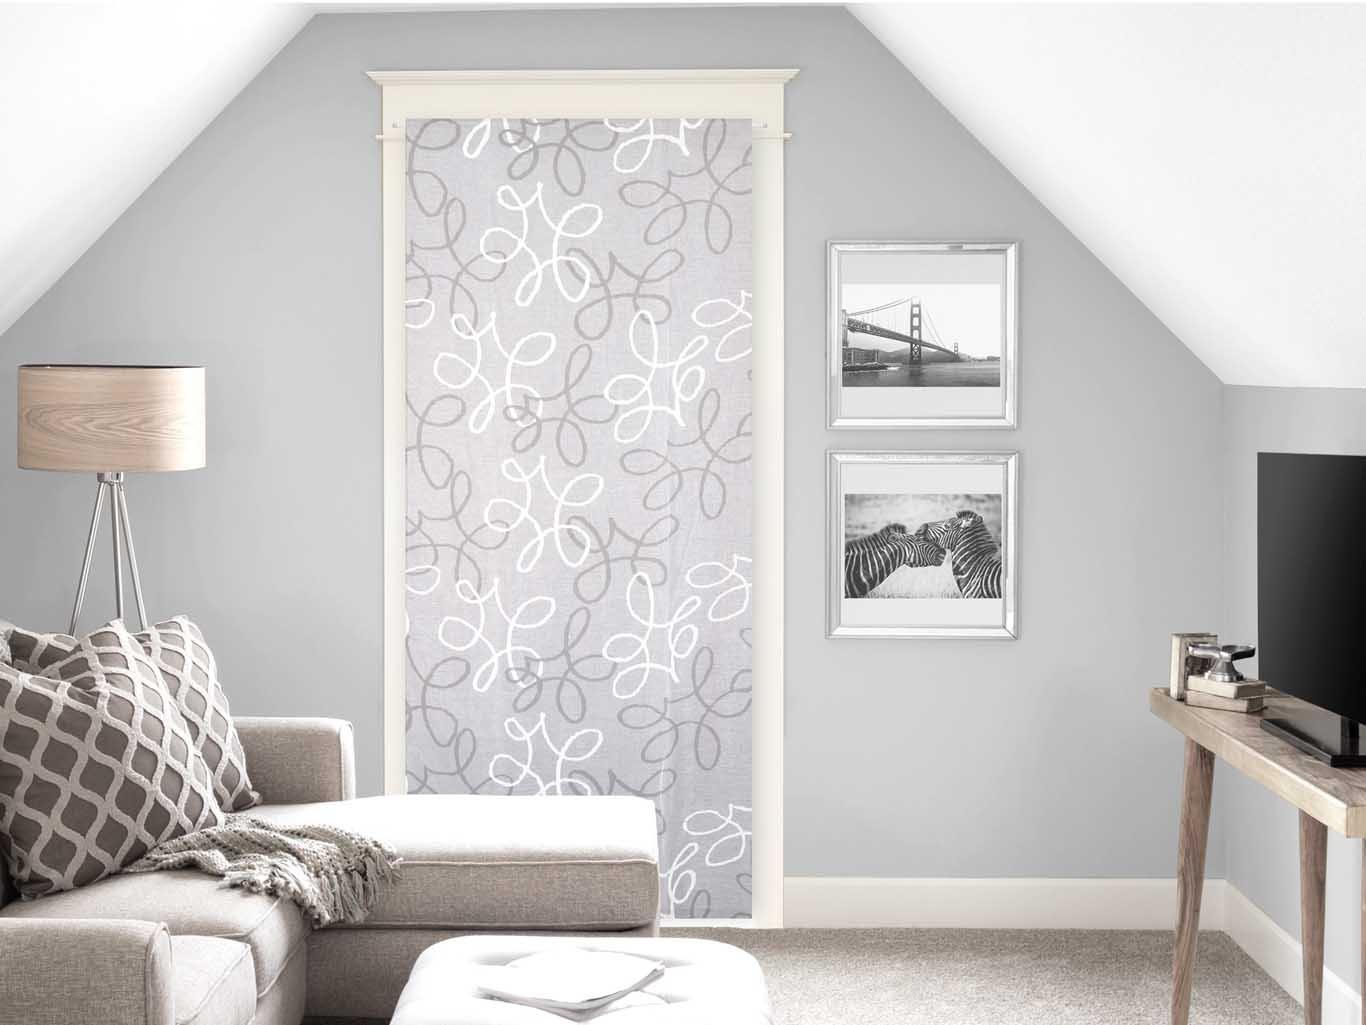 Soleil d'Ocre Brise bise 90x200 Manon, Polyester, Blanc, 90x200 cm Selartex 049027